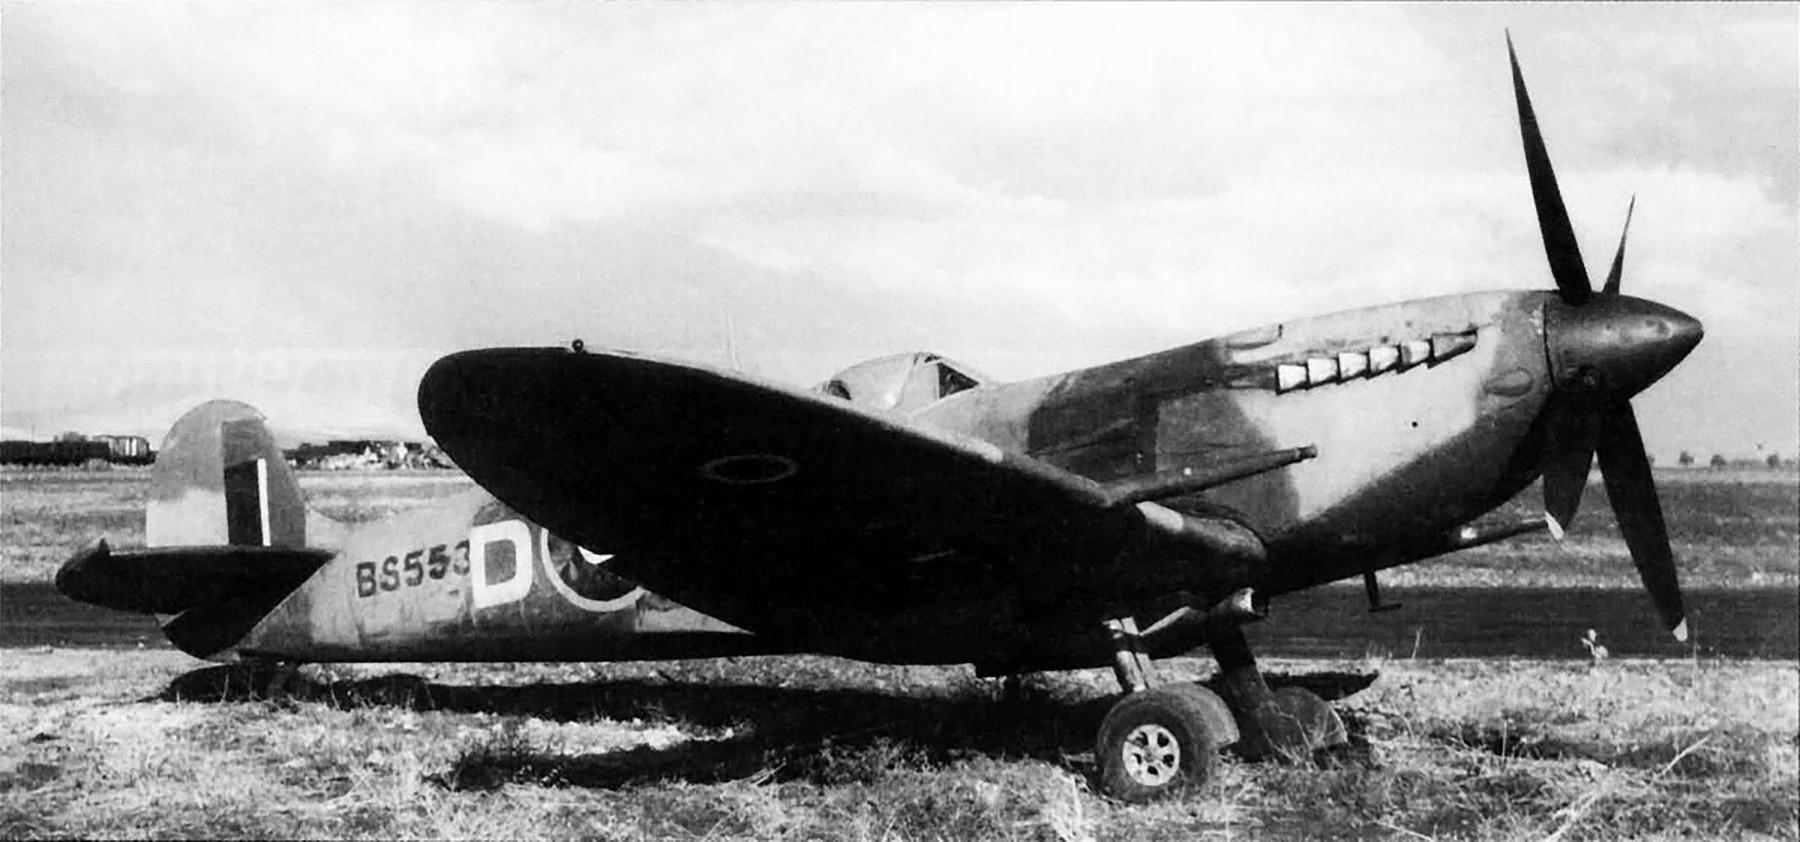 Spitfire MkIX RAF BS553 Sicily Aug 1943 01